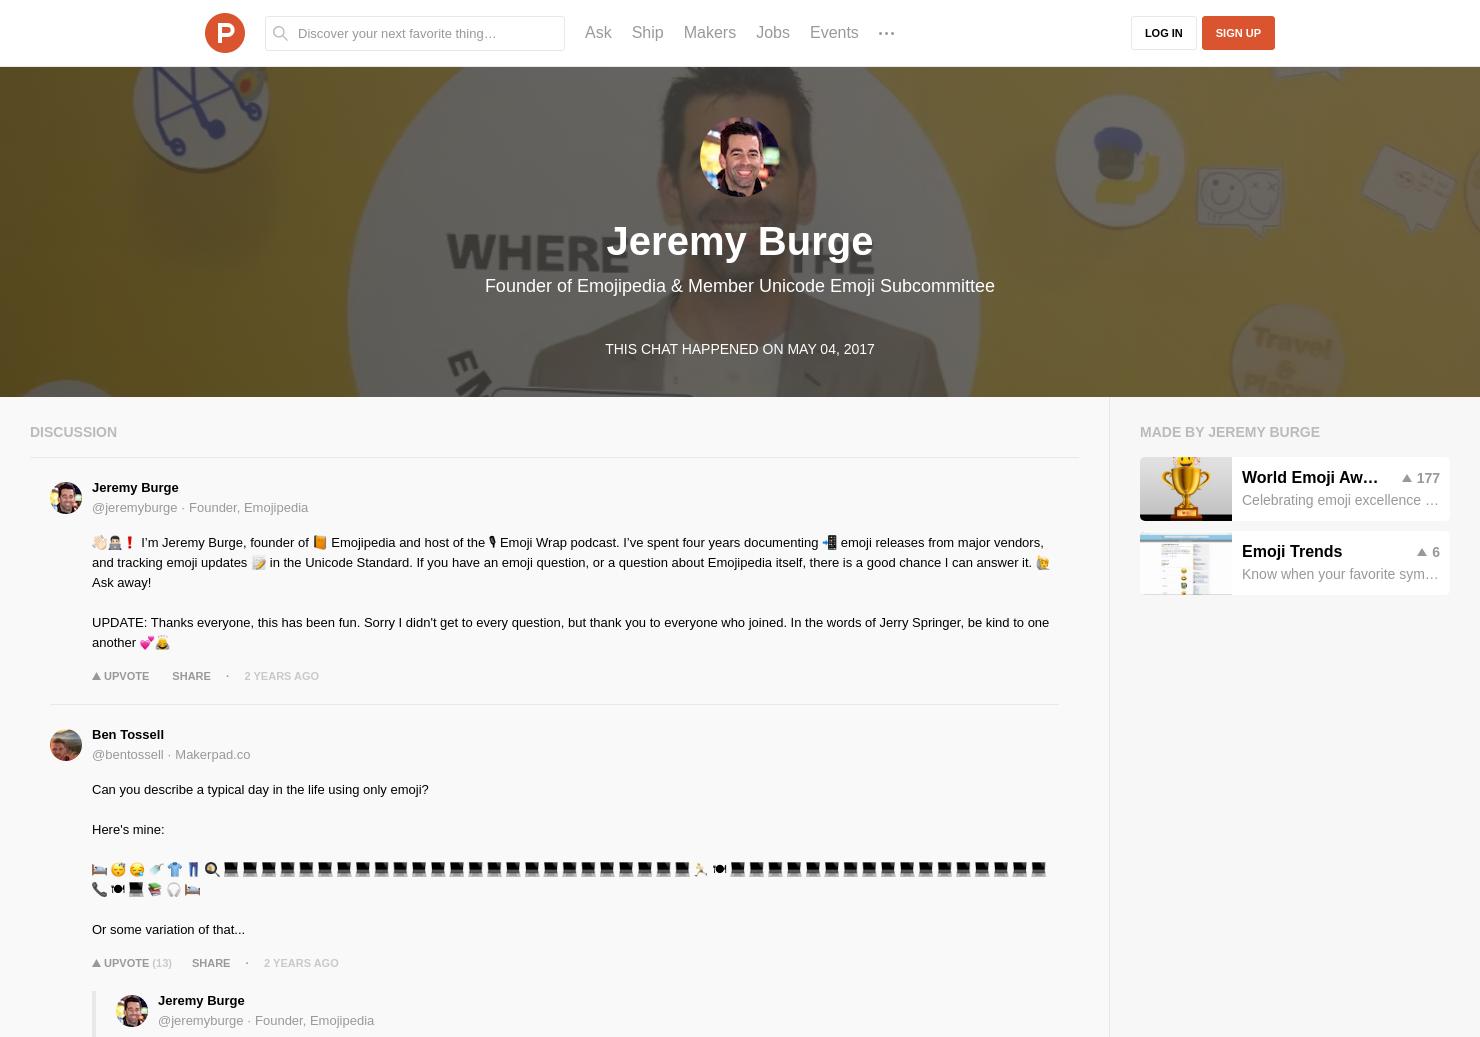 Jeremy Burge LIVE Chat on Product Hunt